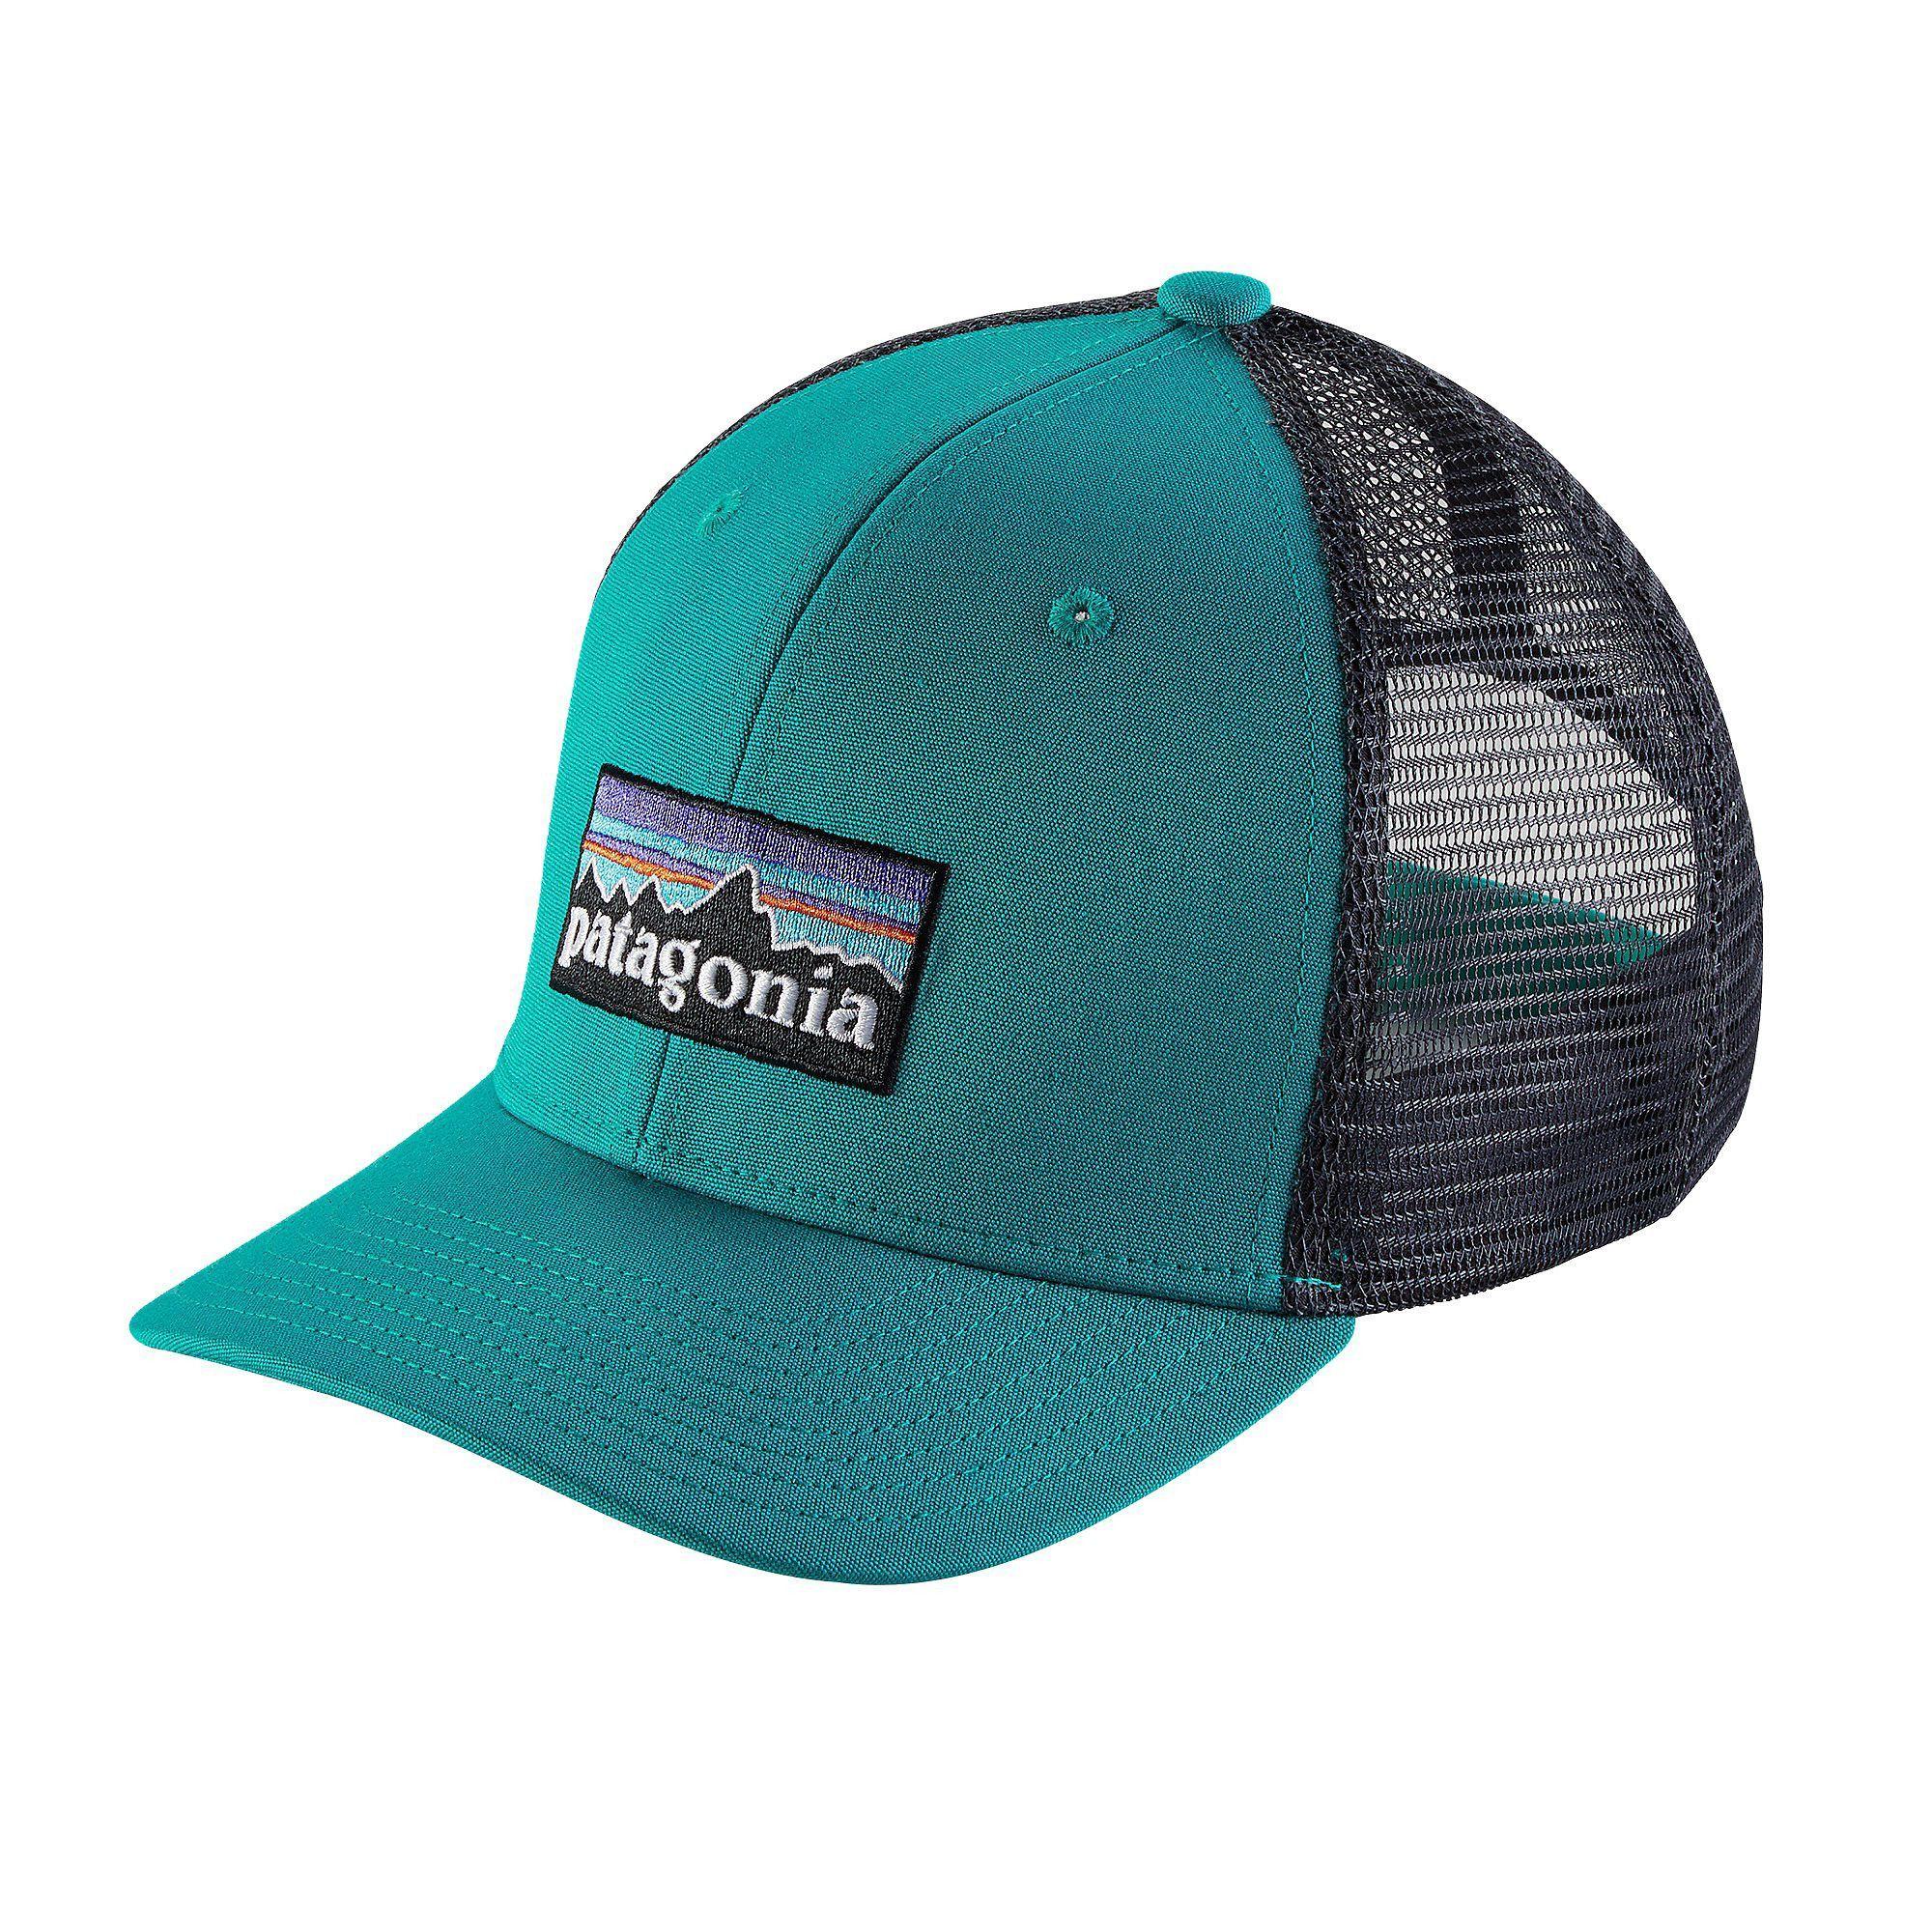 Patagonia Kids Trucker Hat Patagonia Kids Trucker Hat